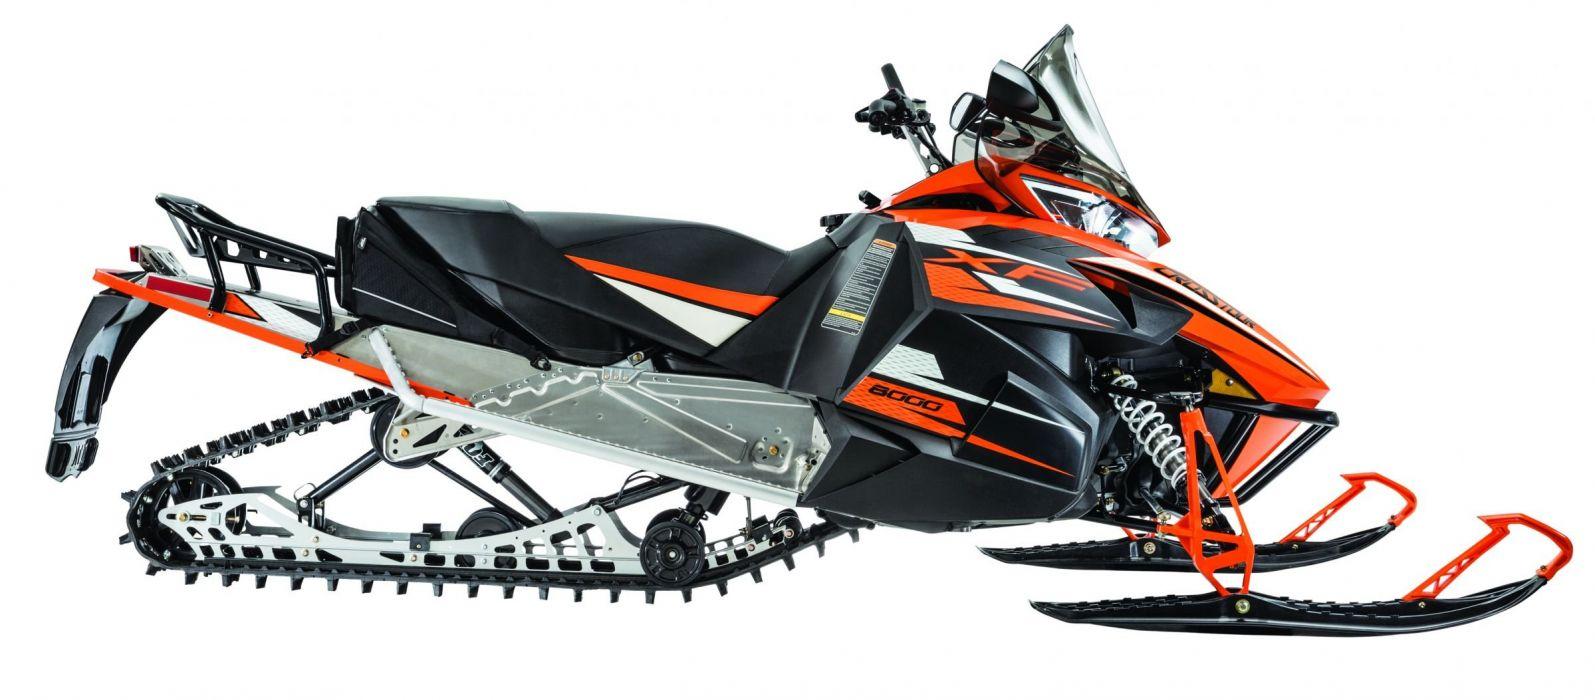 ARTIC CAT X-F 8000 snowmobile sled atv (8) wallpaper